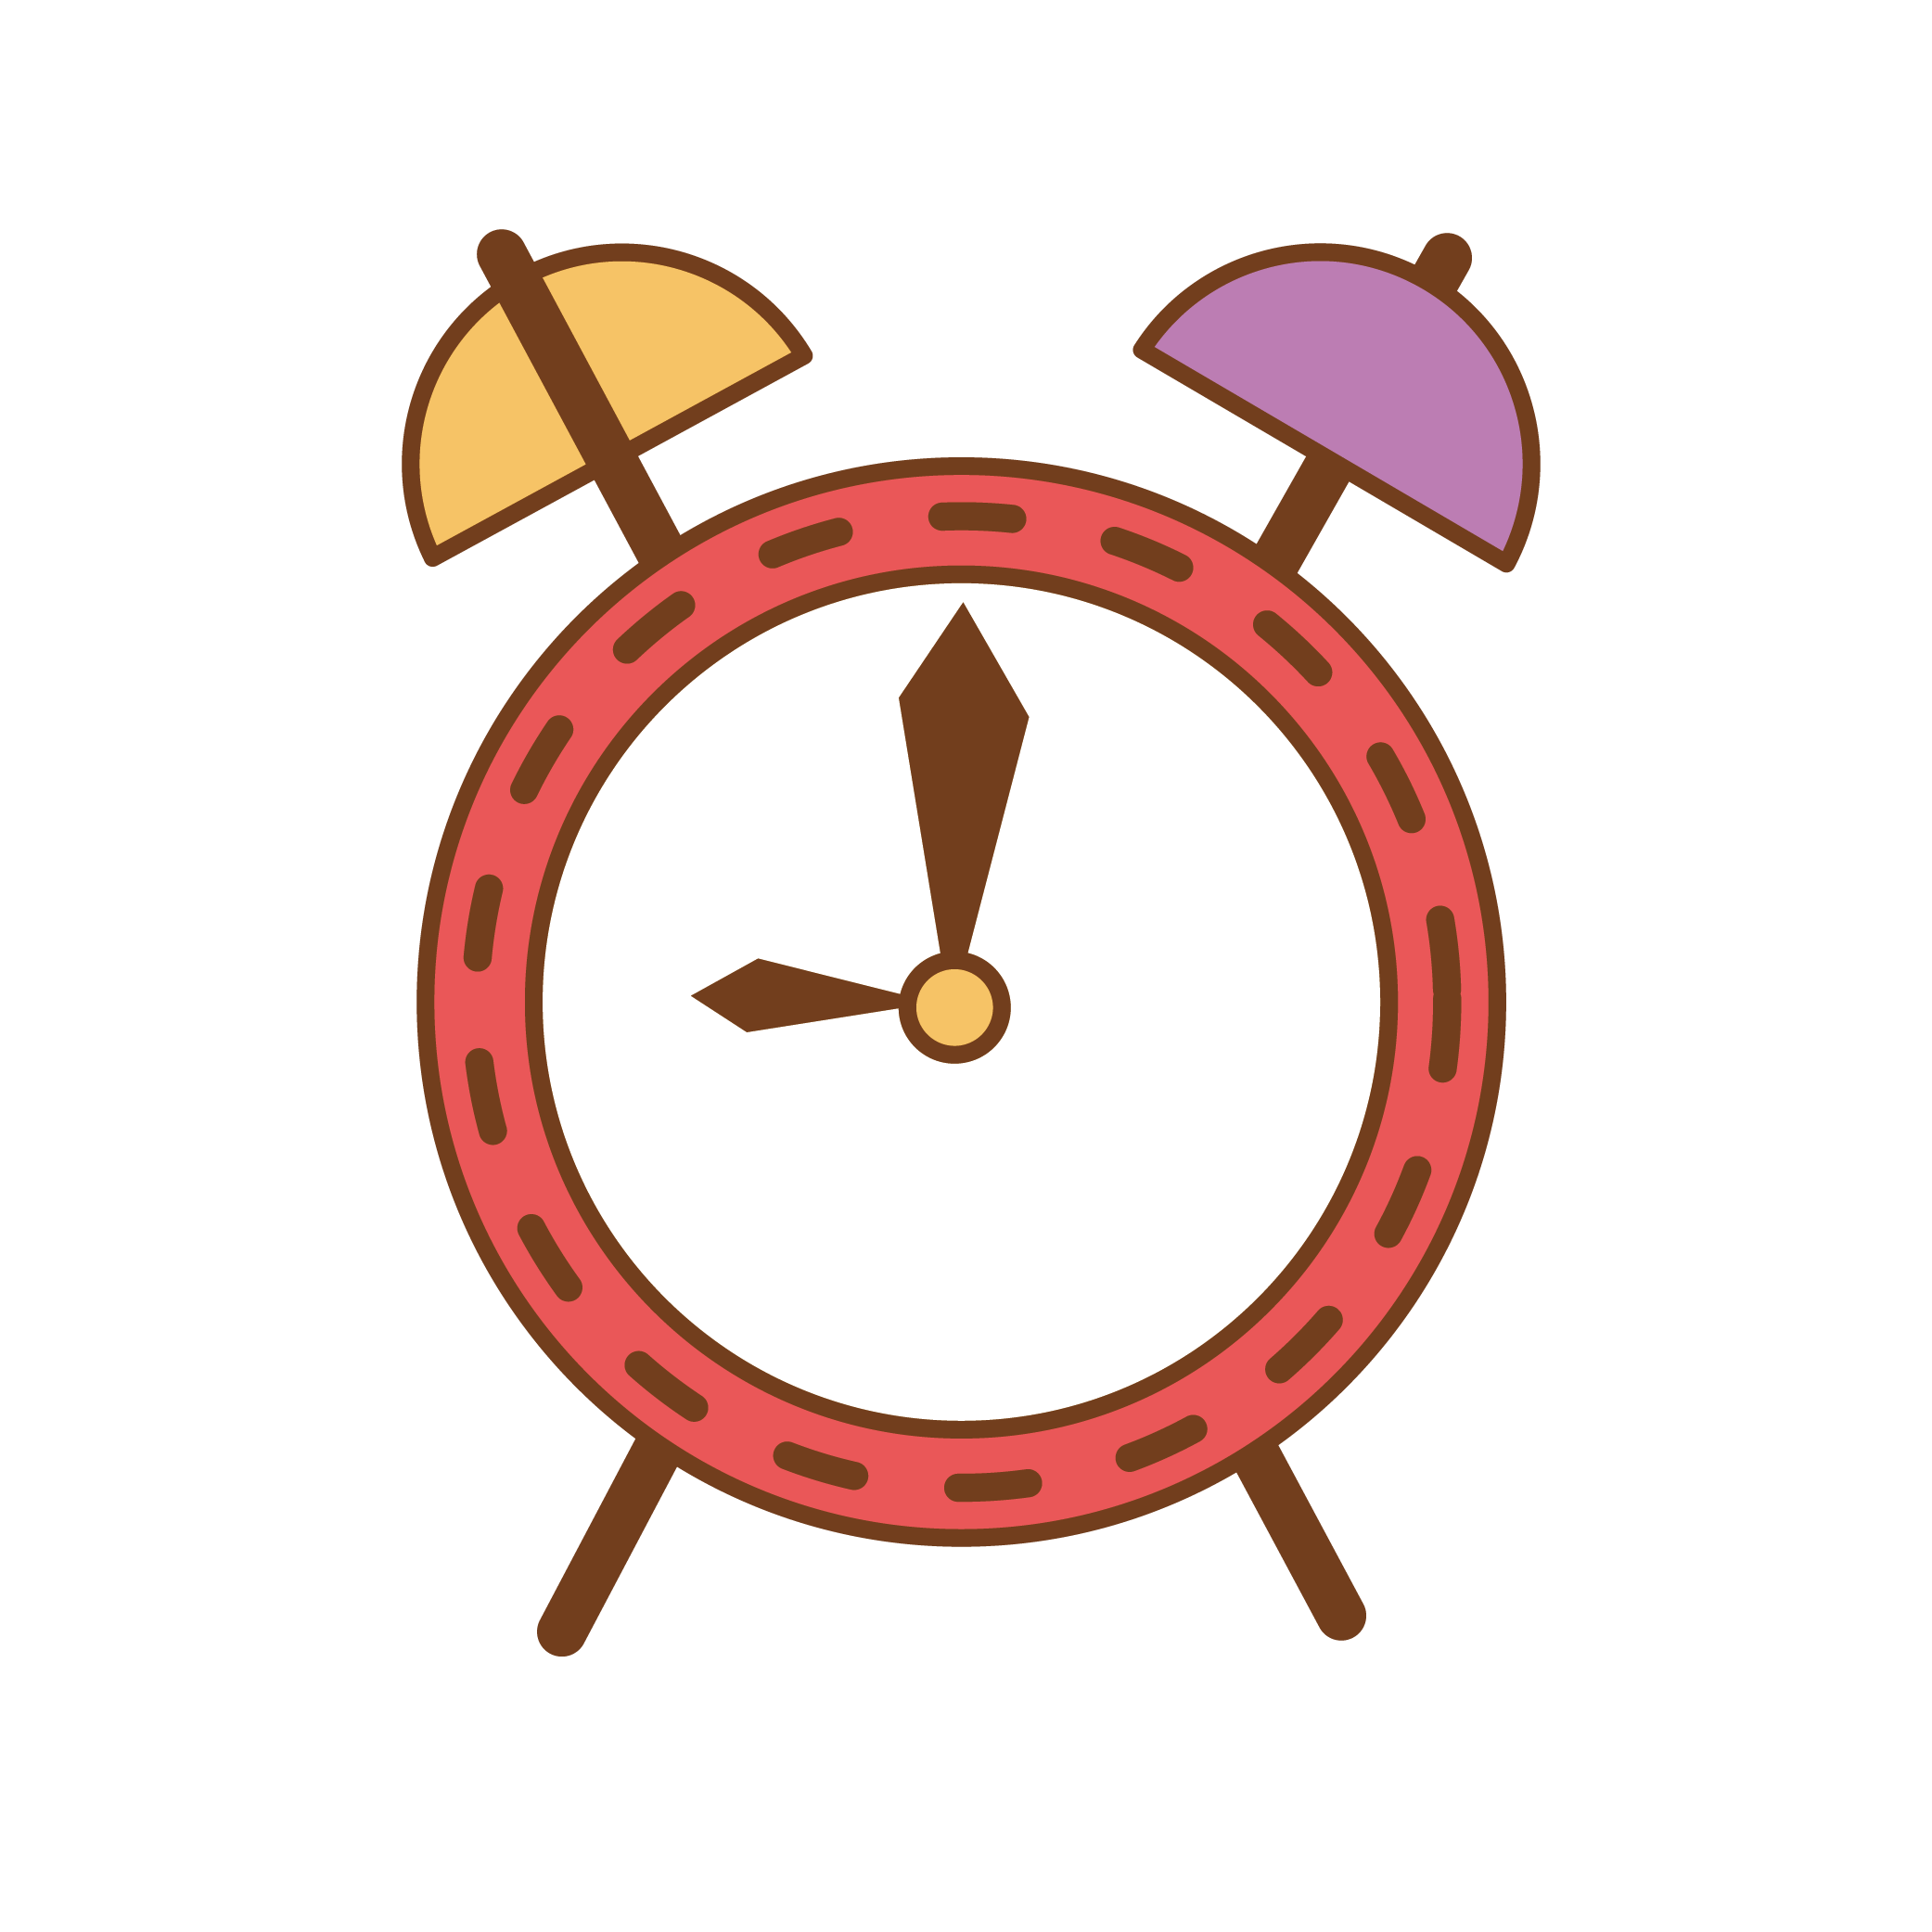 Furniture clipart home accessory. Alarm clock cartoon transprent